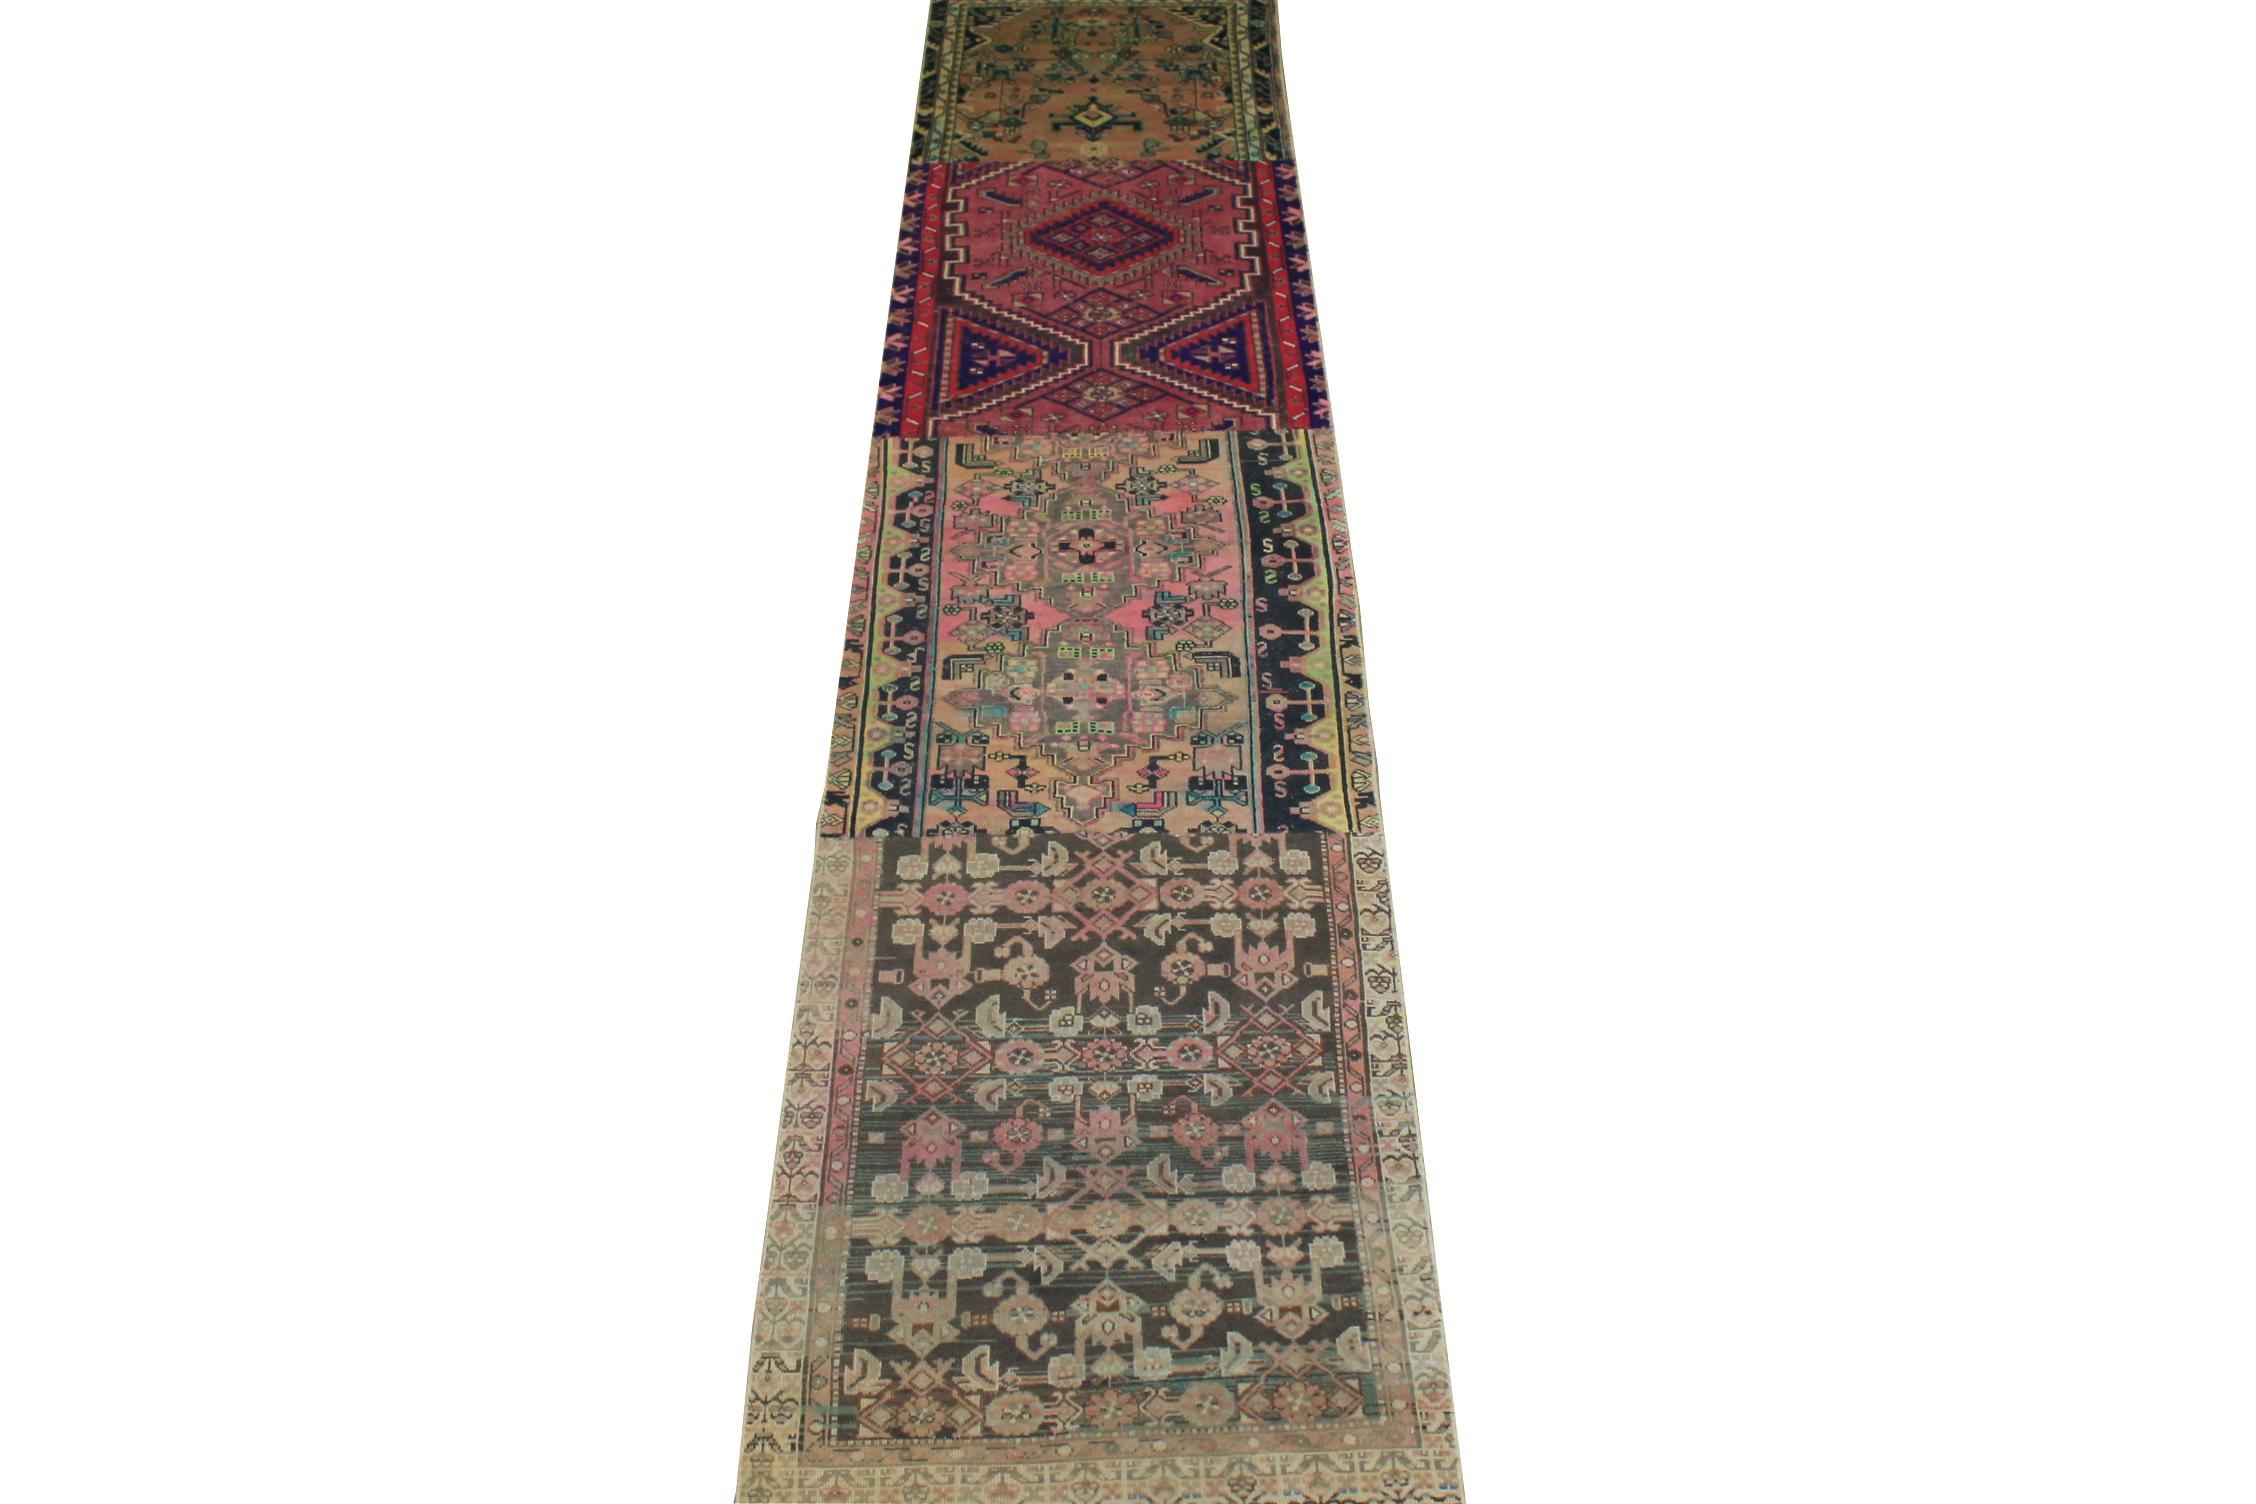 13 ft. & Longer Runner Vintage Hand Knotted Wool Area Rug - MR024509